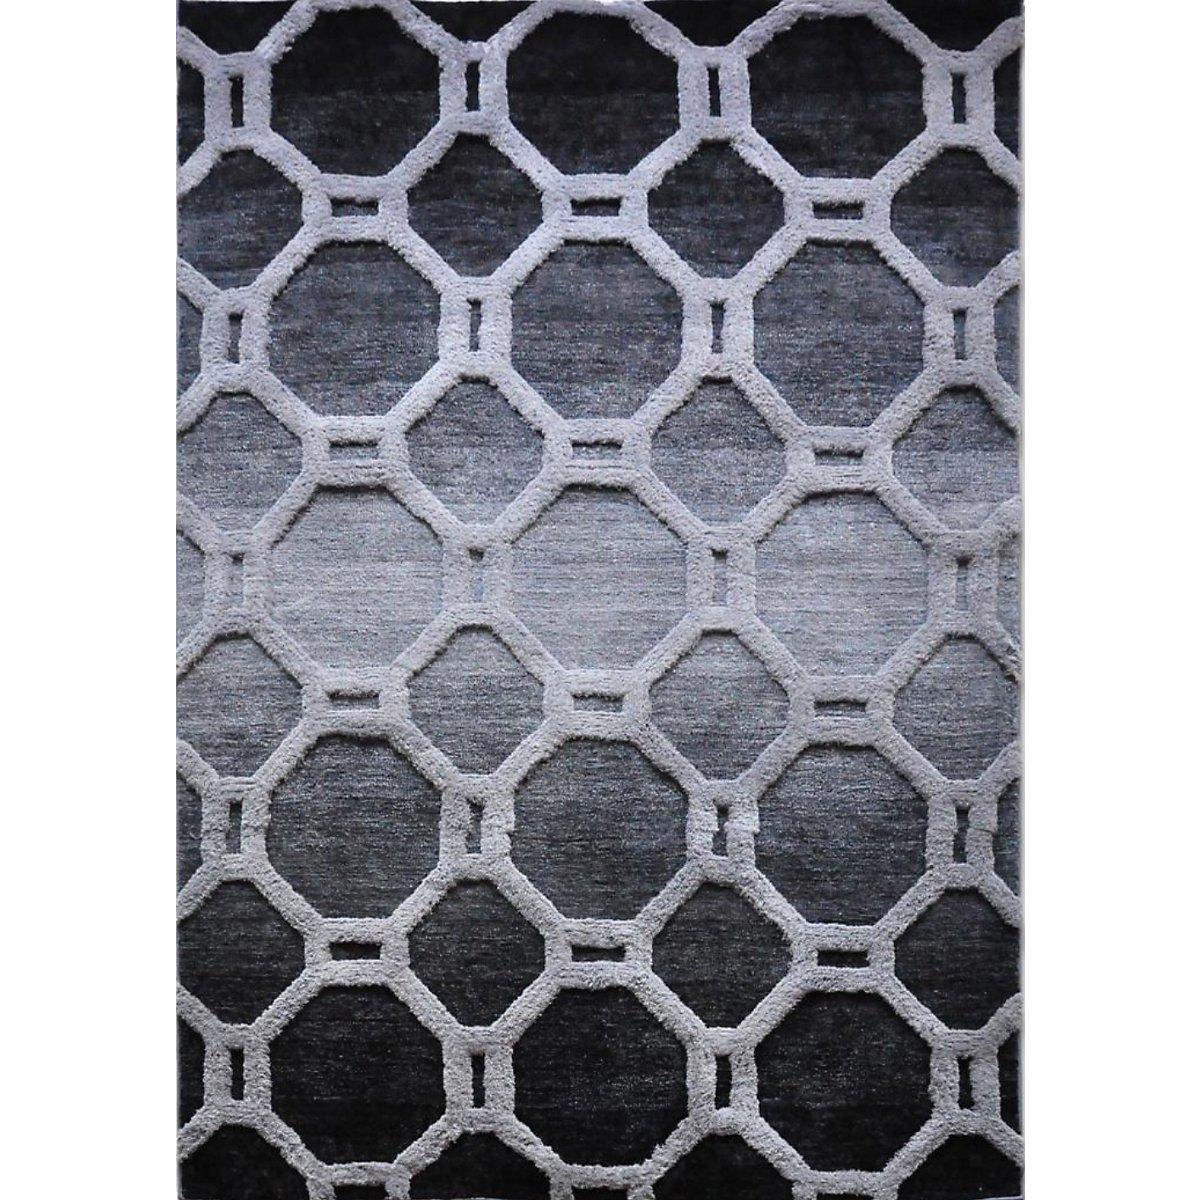 Louvre Dark Gray 8X10 Area Rug